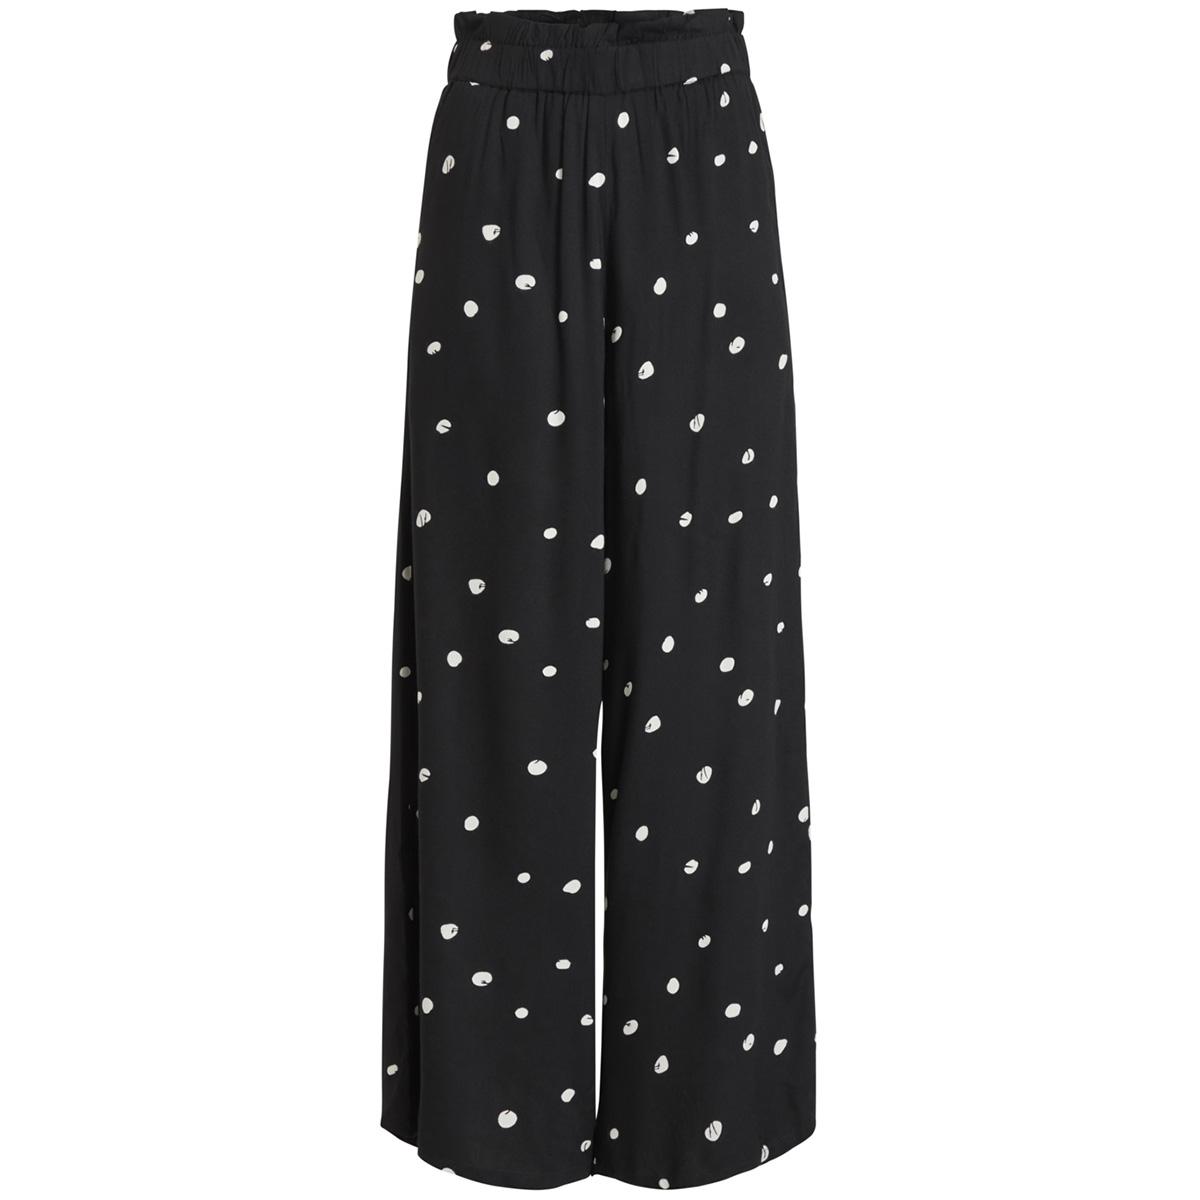 objevie hw pant pb5 23028365 object broek black/white dots